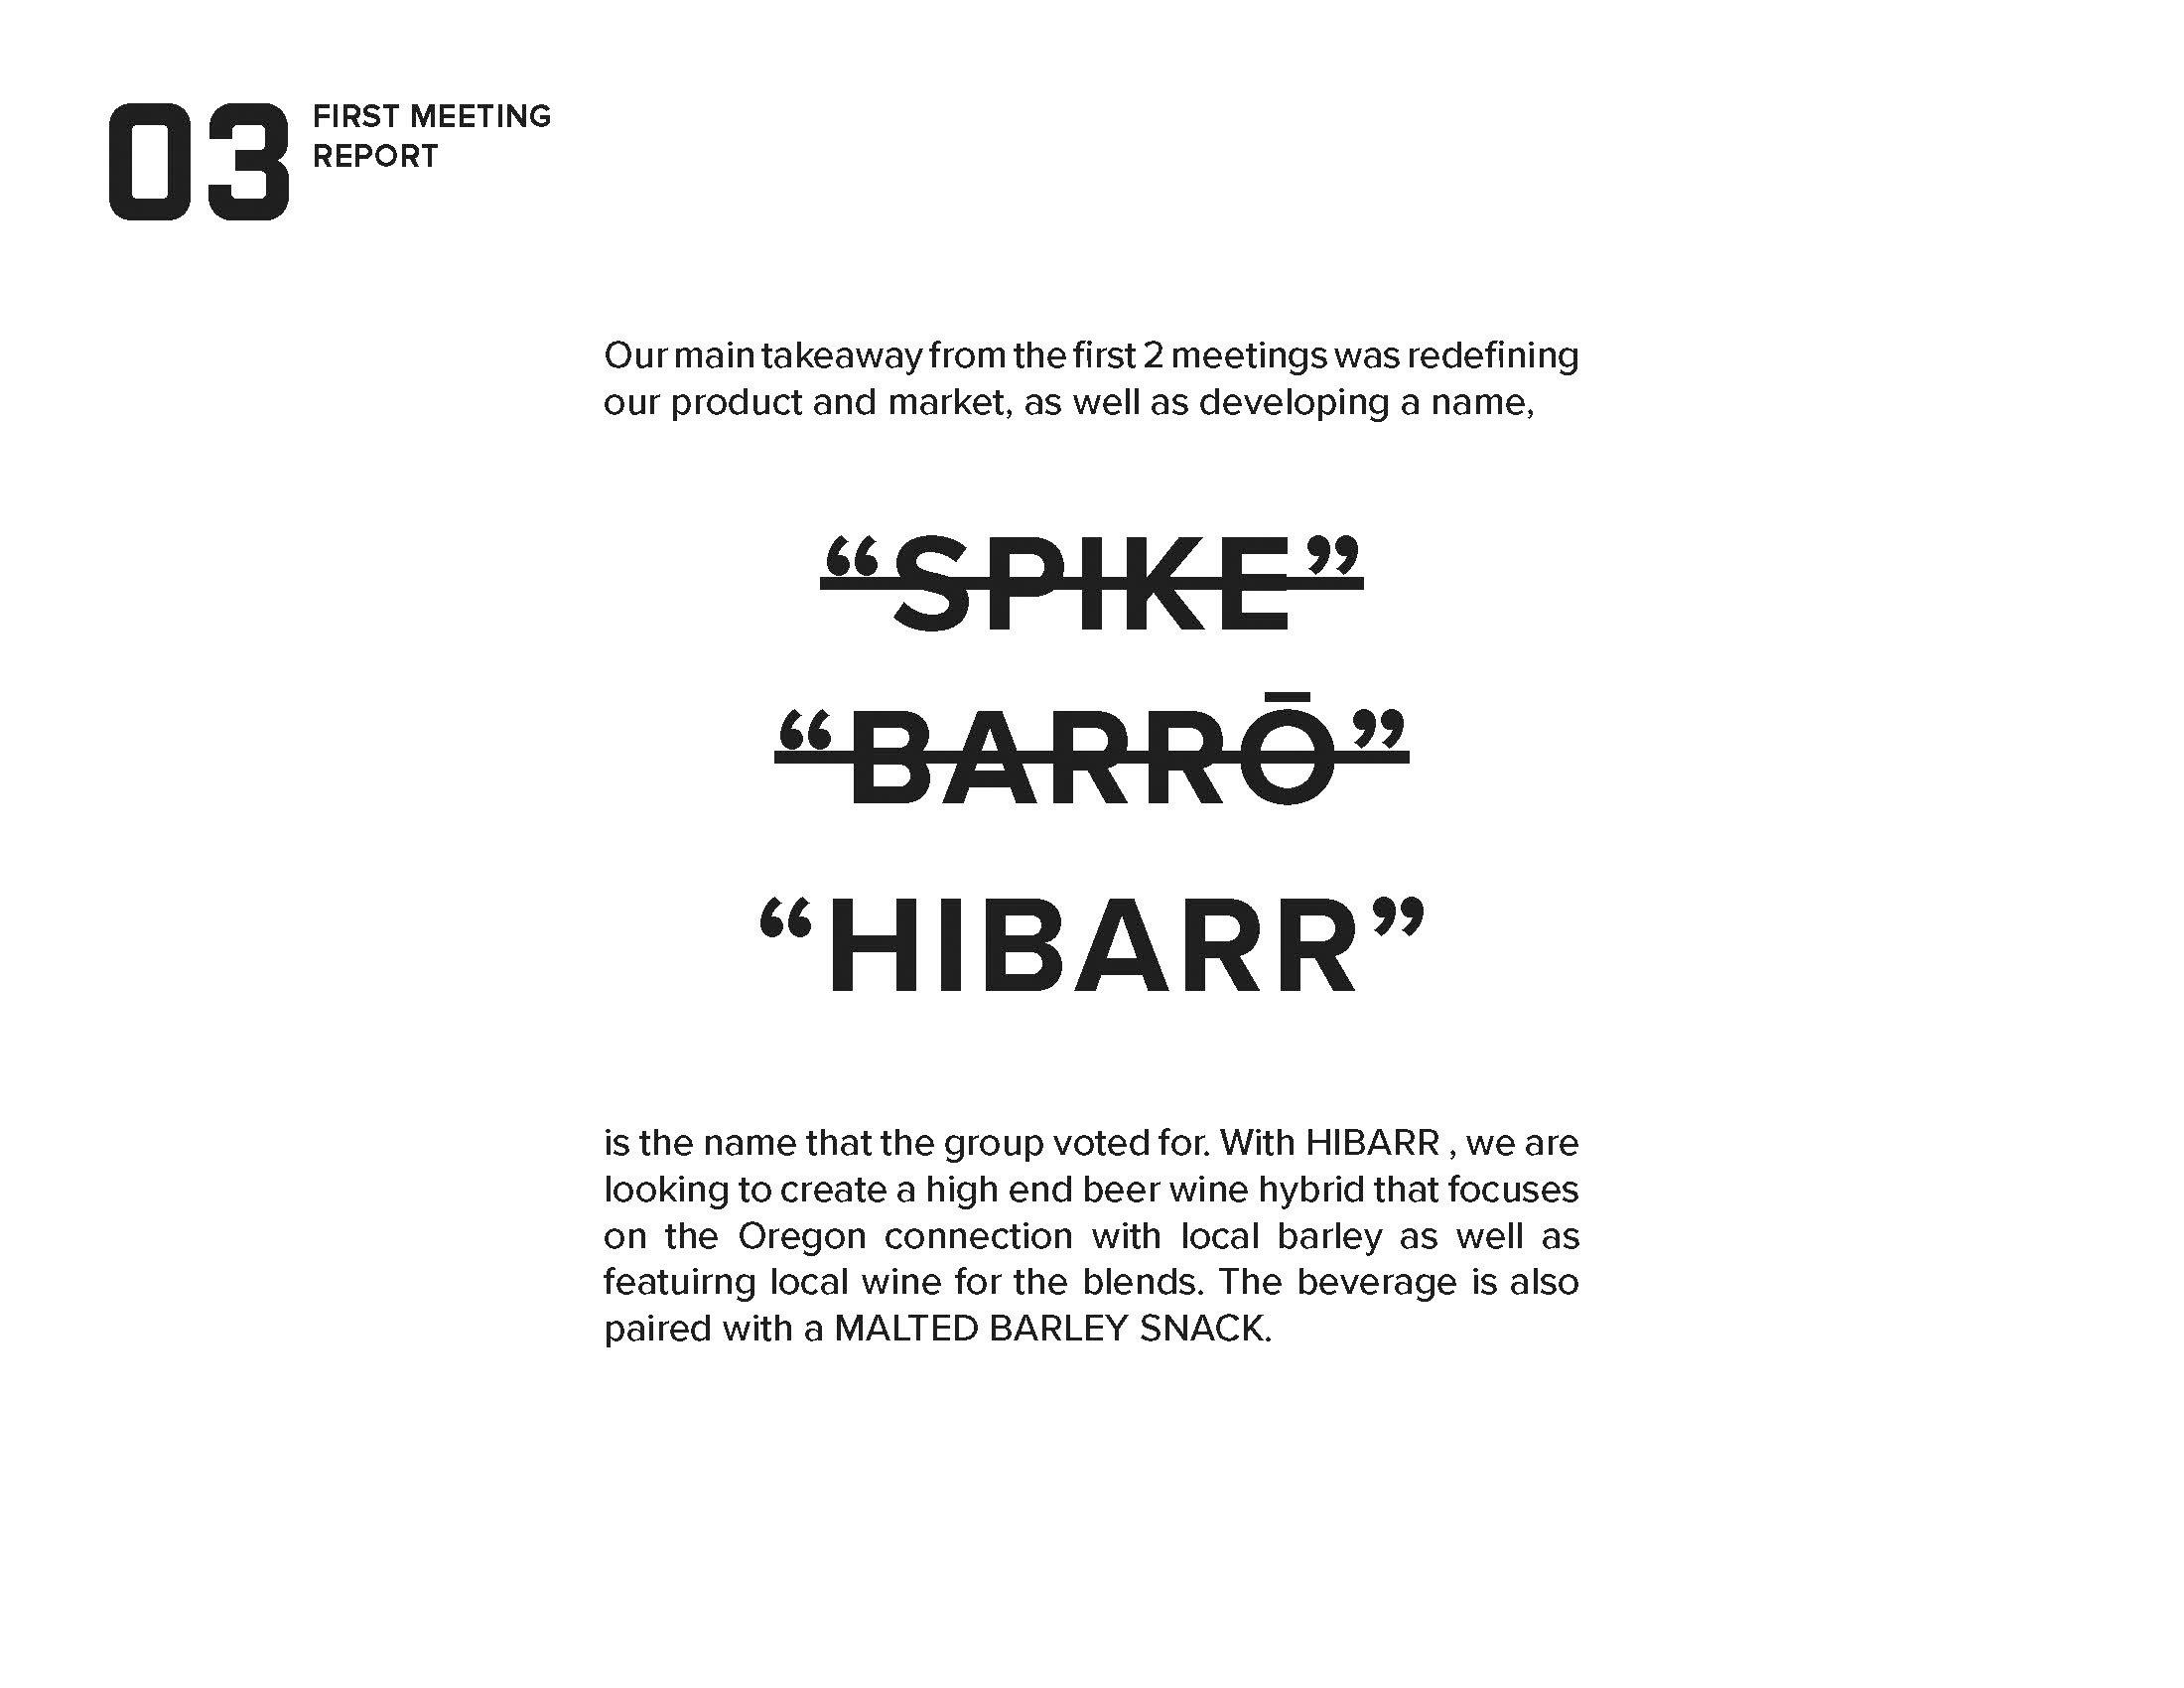 hibarr_presentation_Page_04.jpg